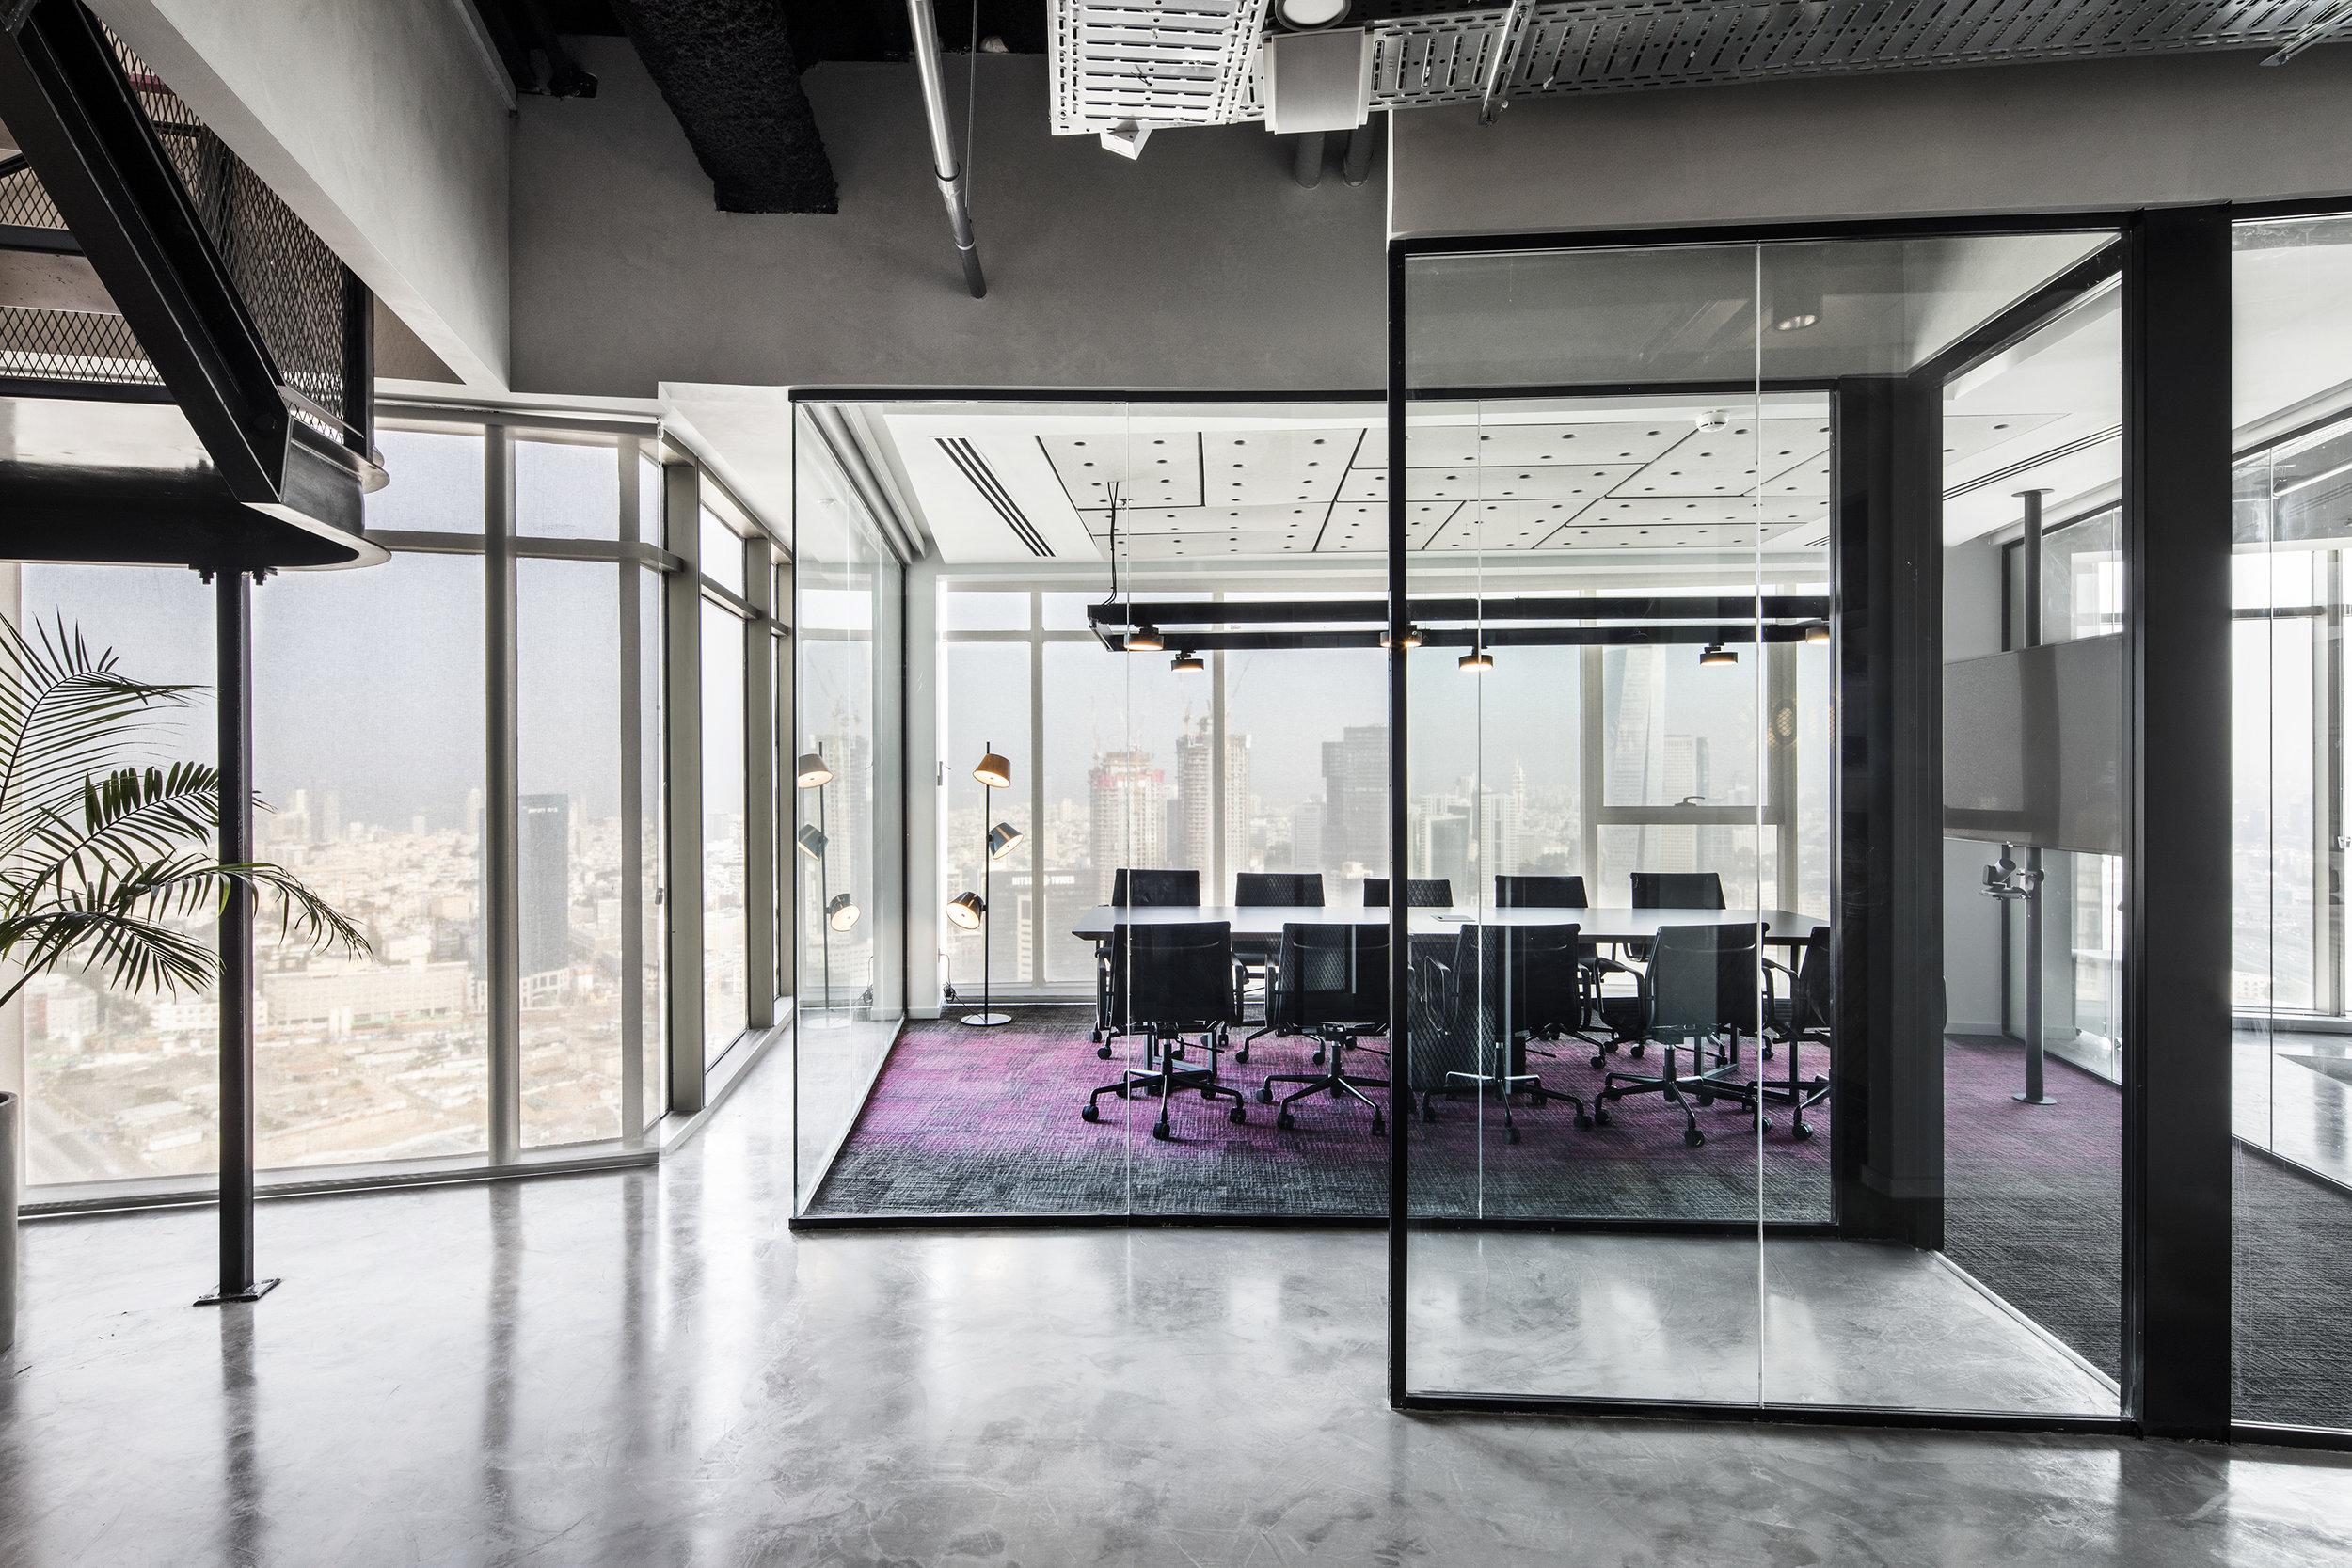 002_optimove - roy david architecture studio.jpg.jpg